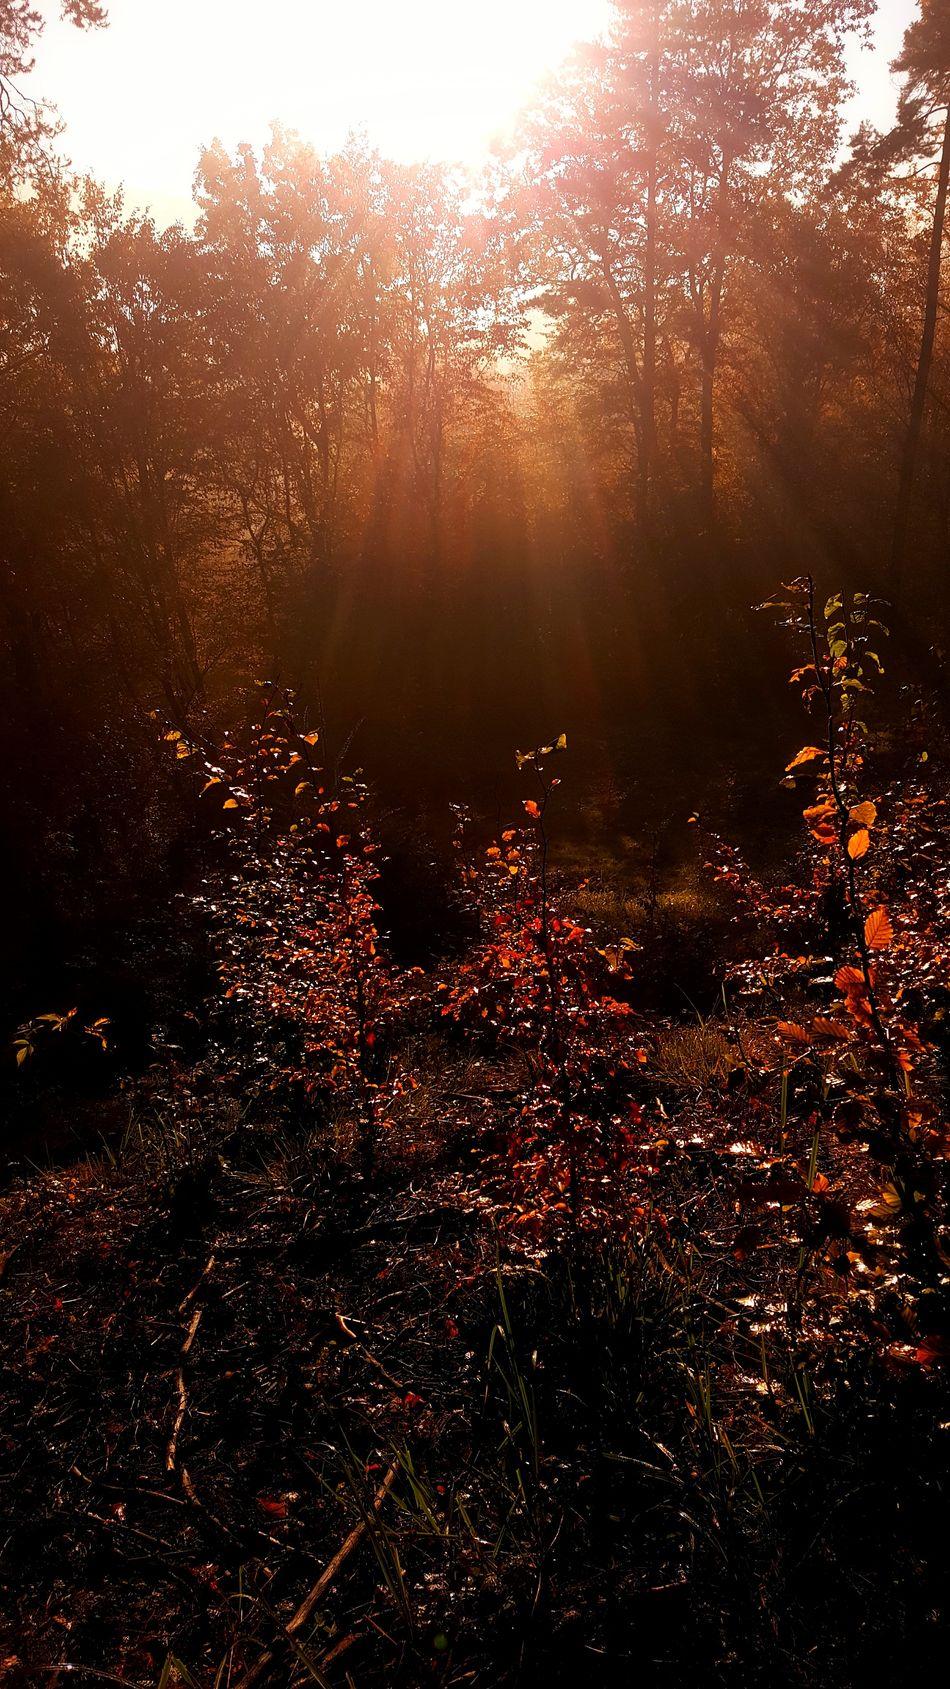 Beauty In Nature Day Forest Landscape Nature No People Outdoors Poland Scenics Sun Sunbeam Sunlight Sunrise Tree Tree Area